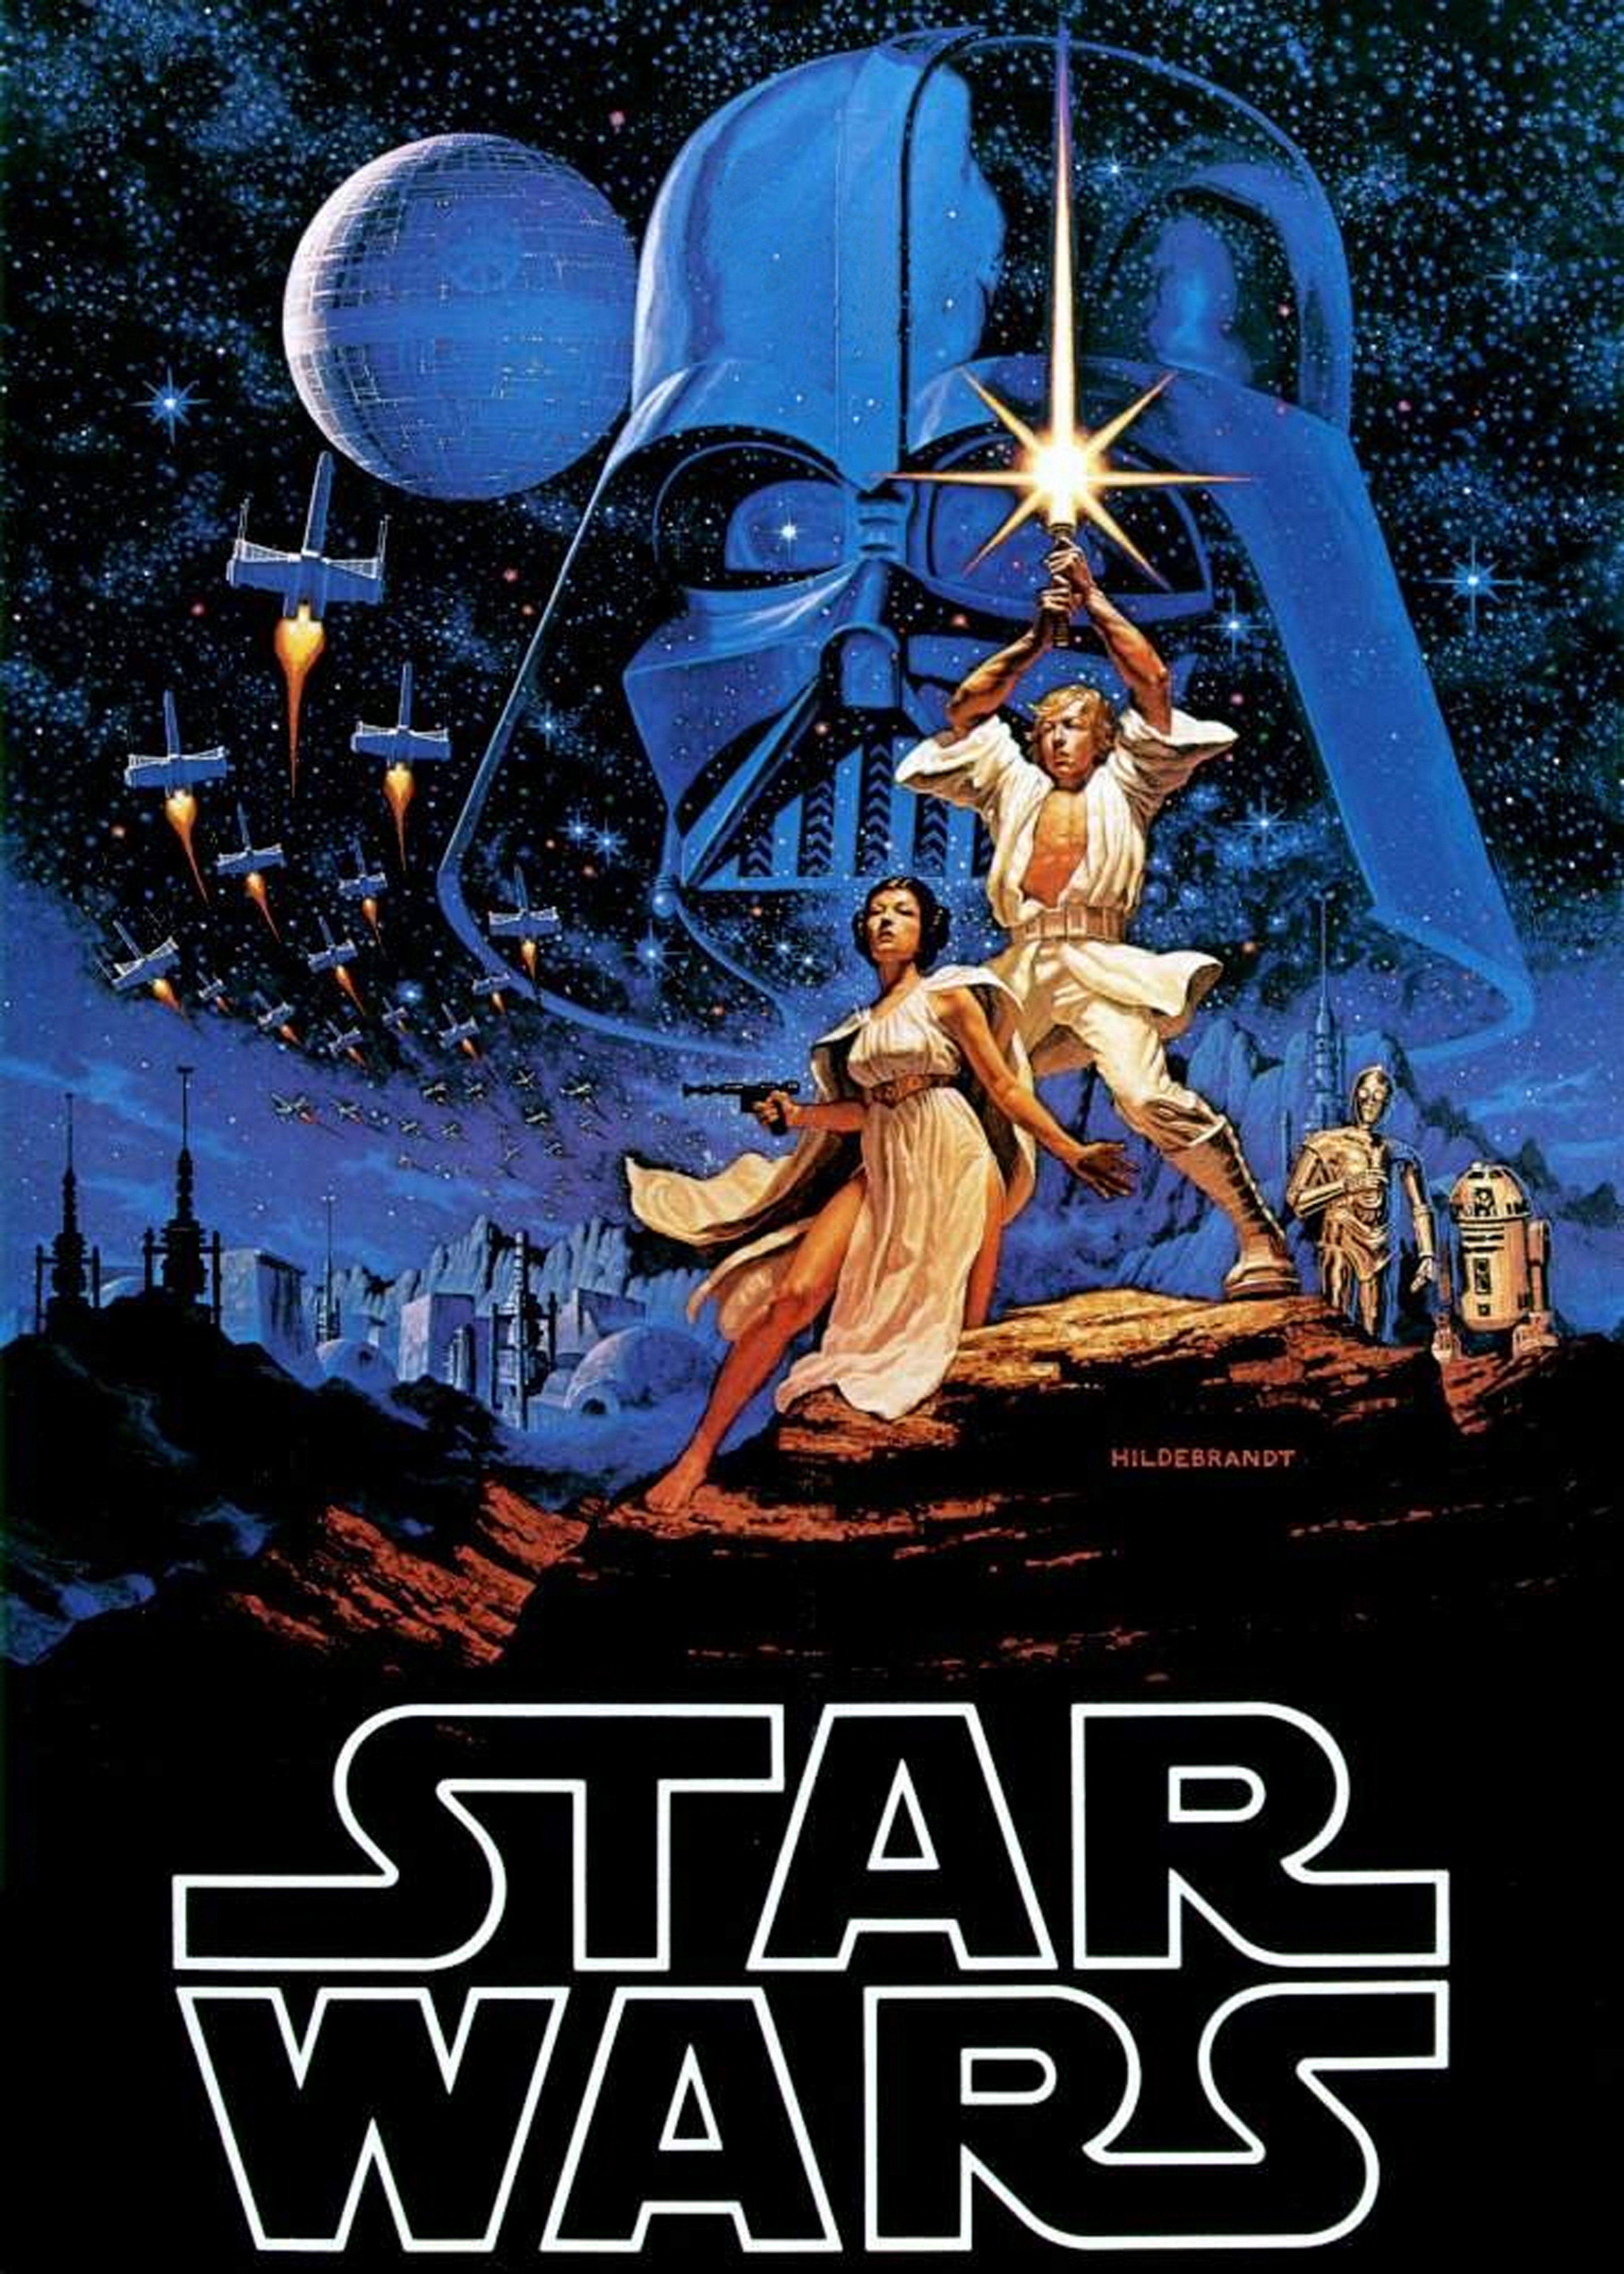 STAR WARS JEDI Home Wall Art Print A4,A3,A2,A1 Vintage Movie Film Poster